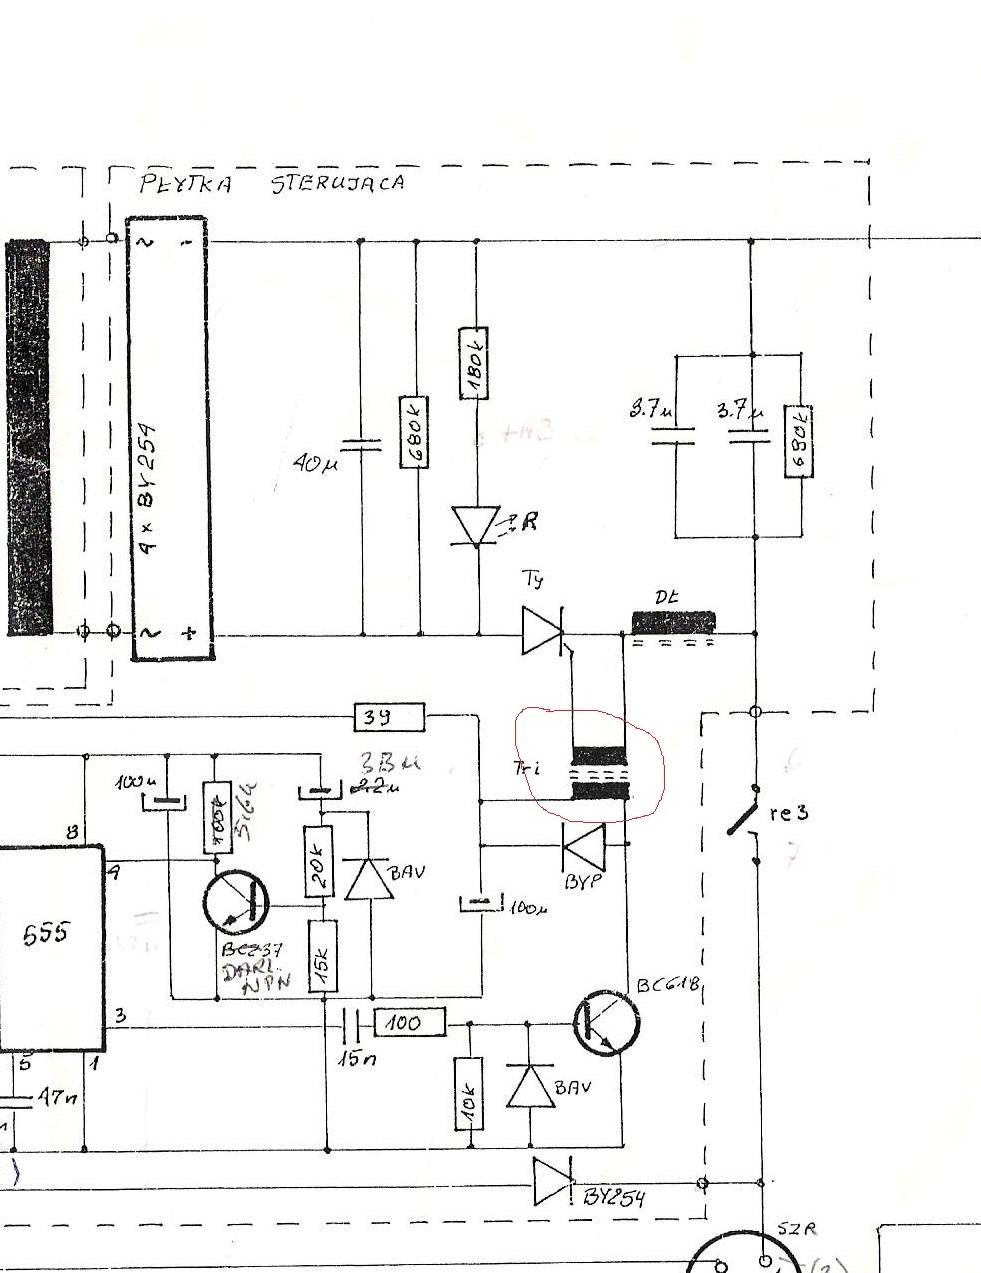 iup-12 - identyfikacja transformatora